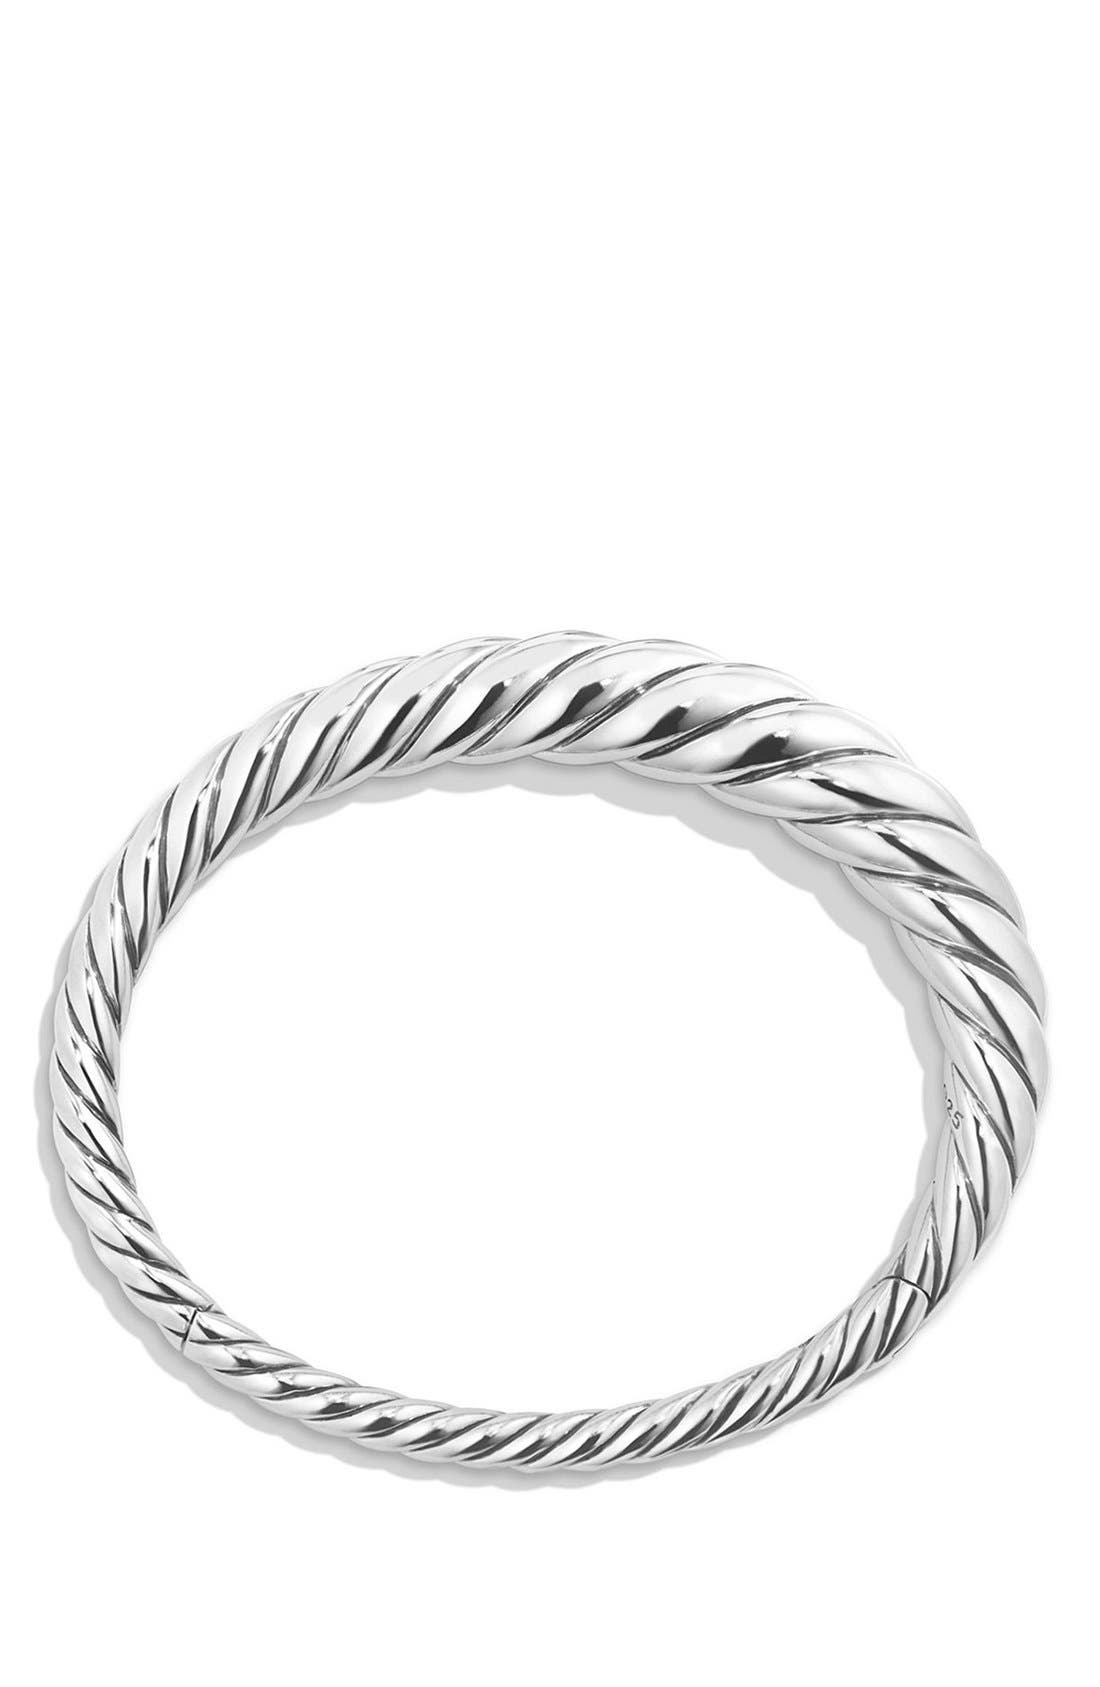 Alternate Image 2  - David Yurman 'Pure Form' Small Cable Bracelet